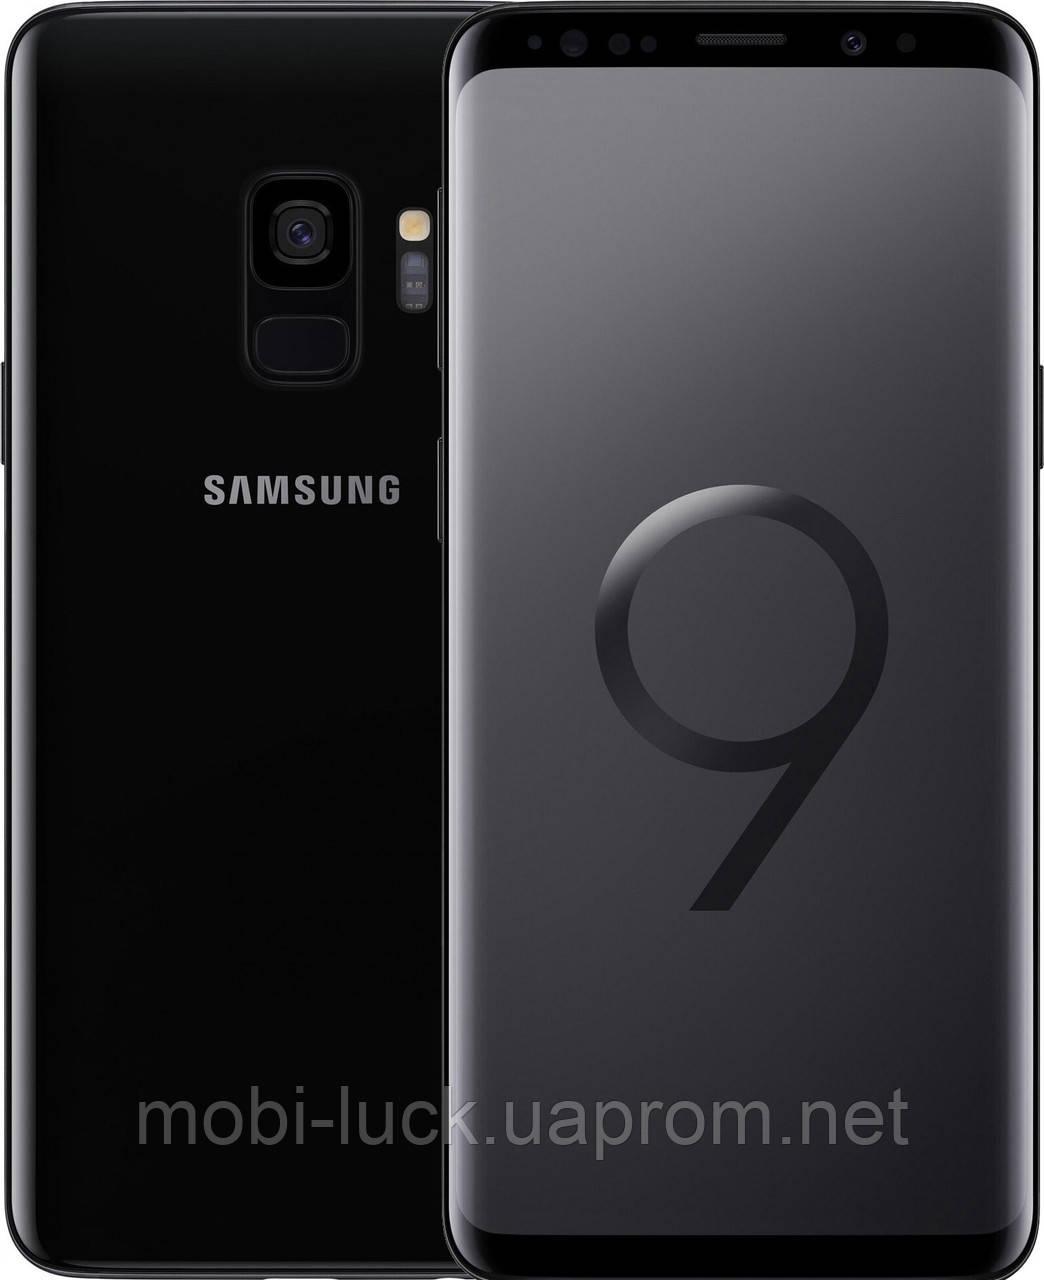 Смартфон Samsung Galaxy S9 2 SIM G960FD Back 64GB G960FD Seller Refurbished